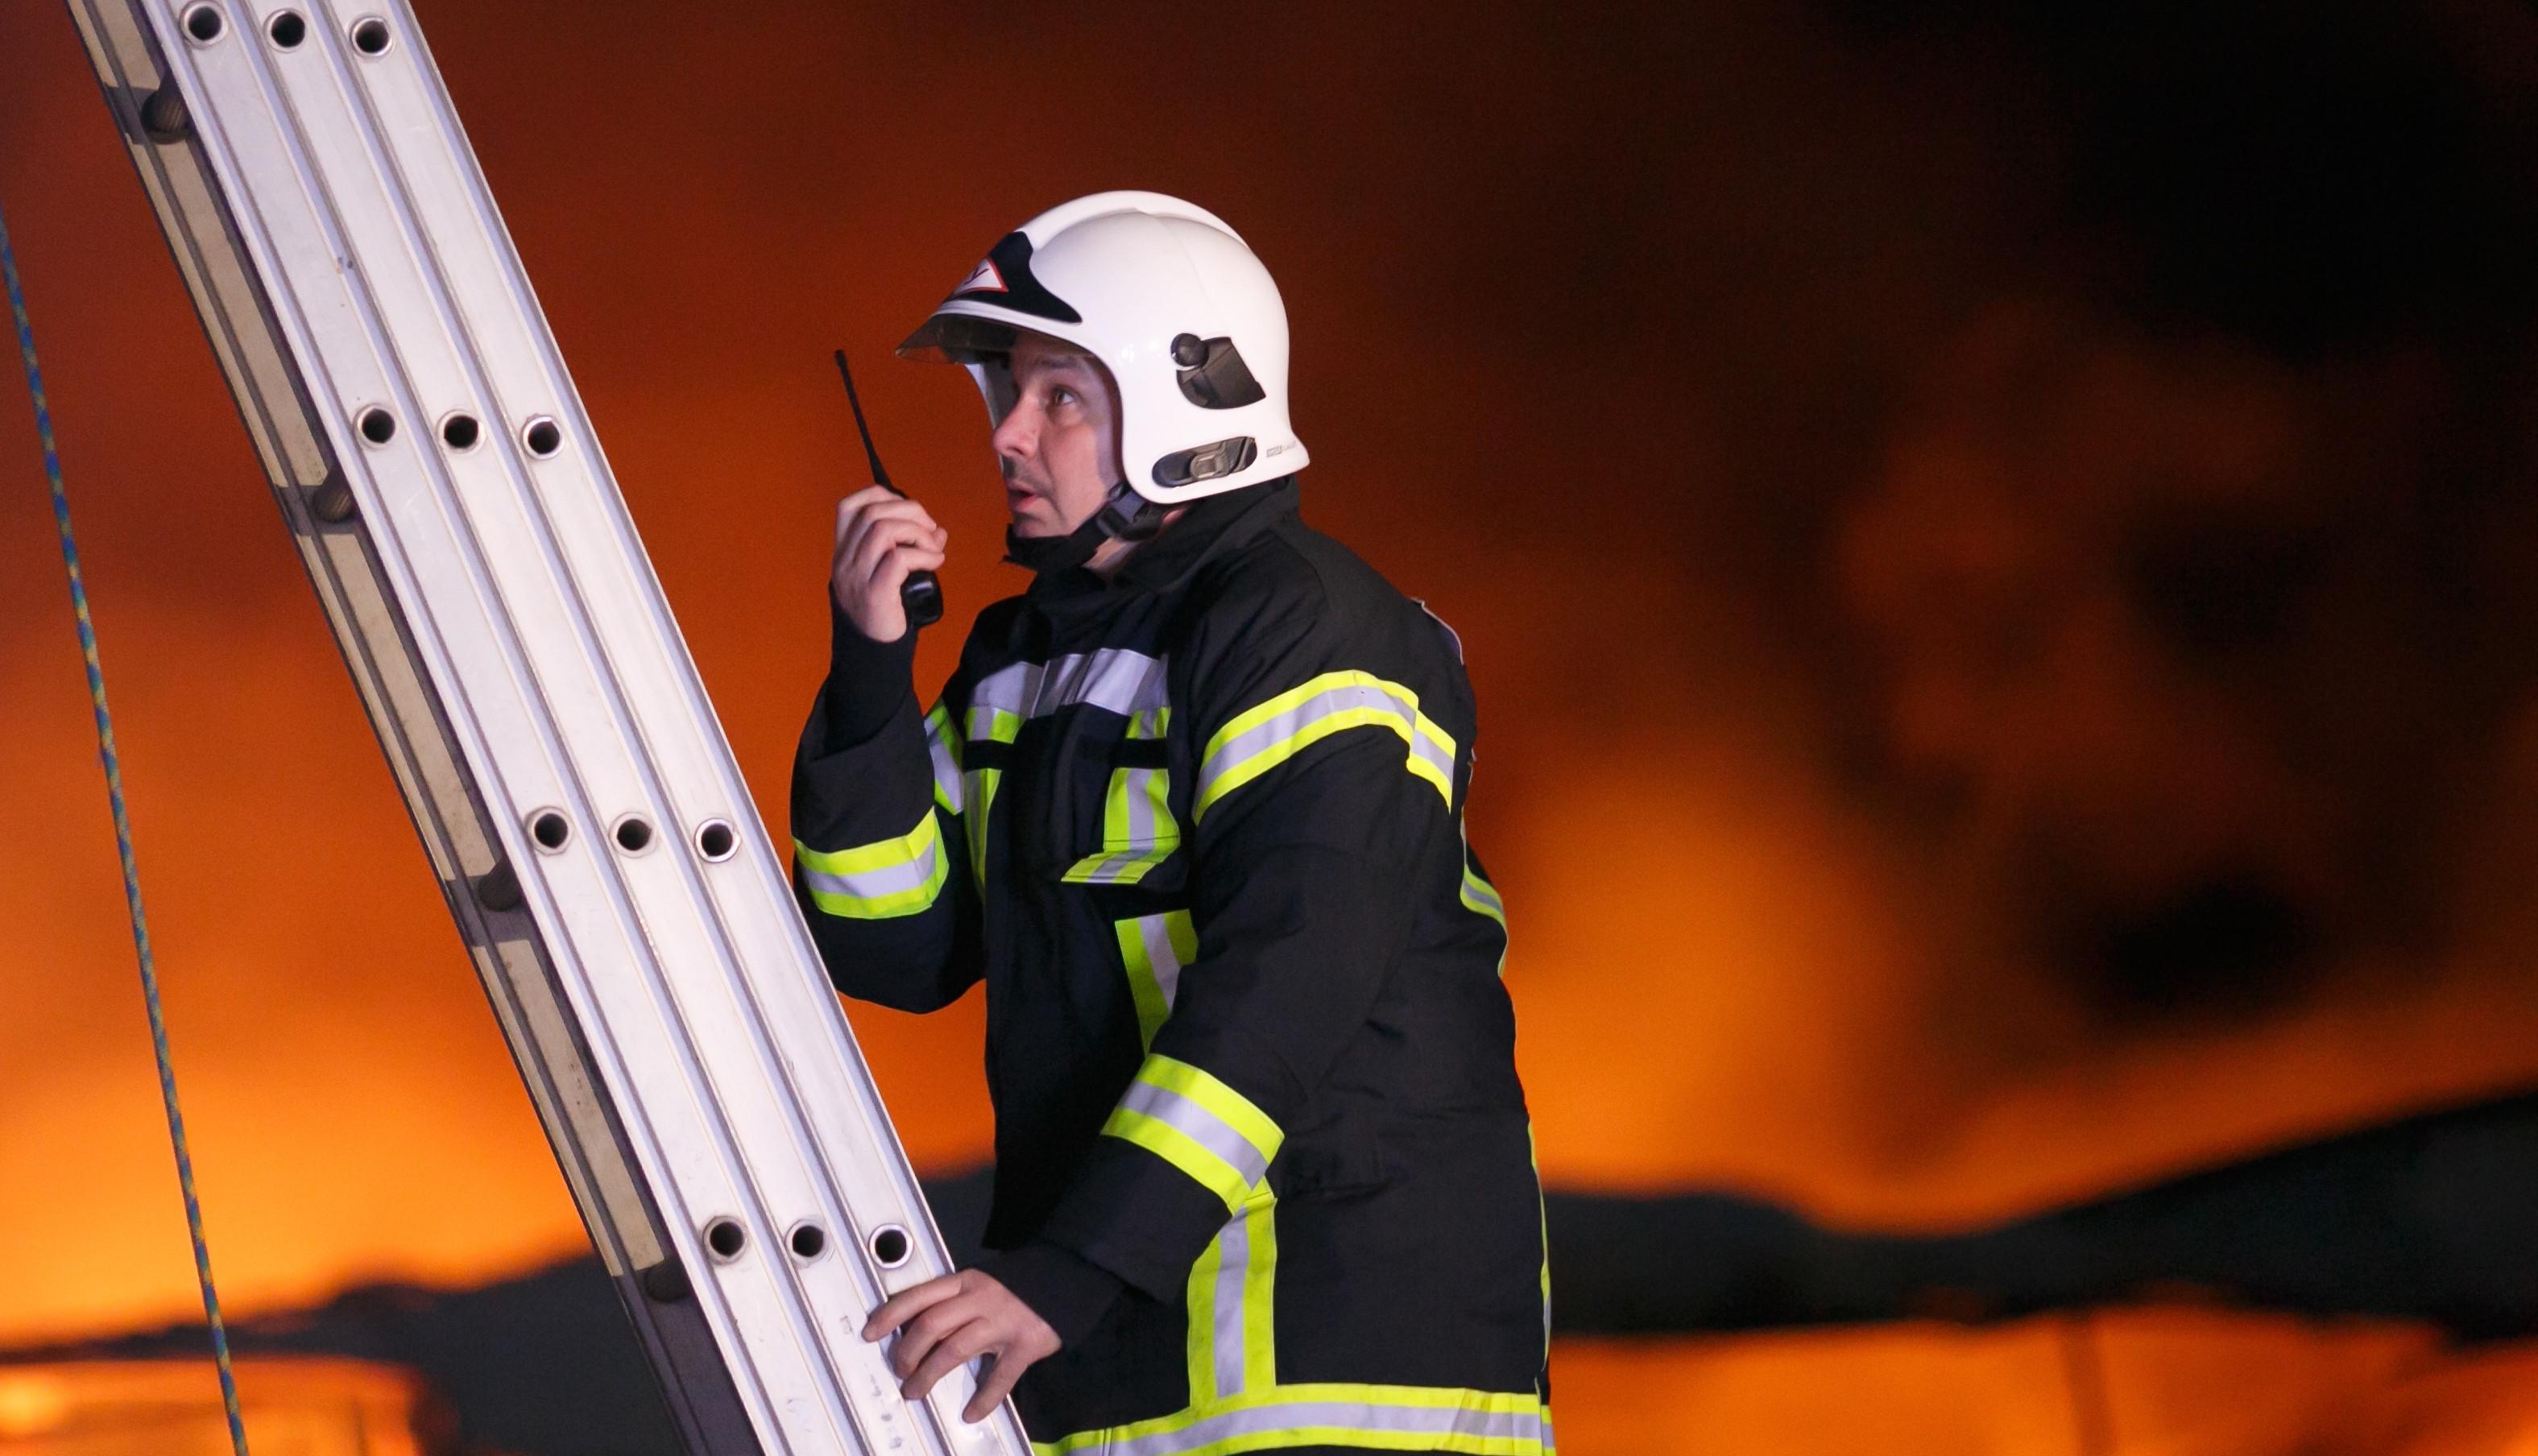 <p><span>Сотрудник противопожарной службы. Фото: &copy; РИА Новости/Кирилл Брага</span></p>